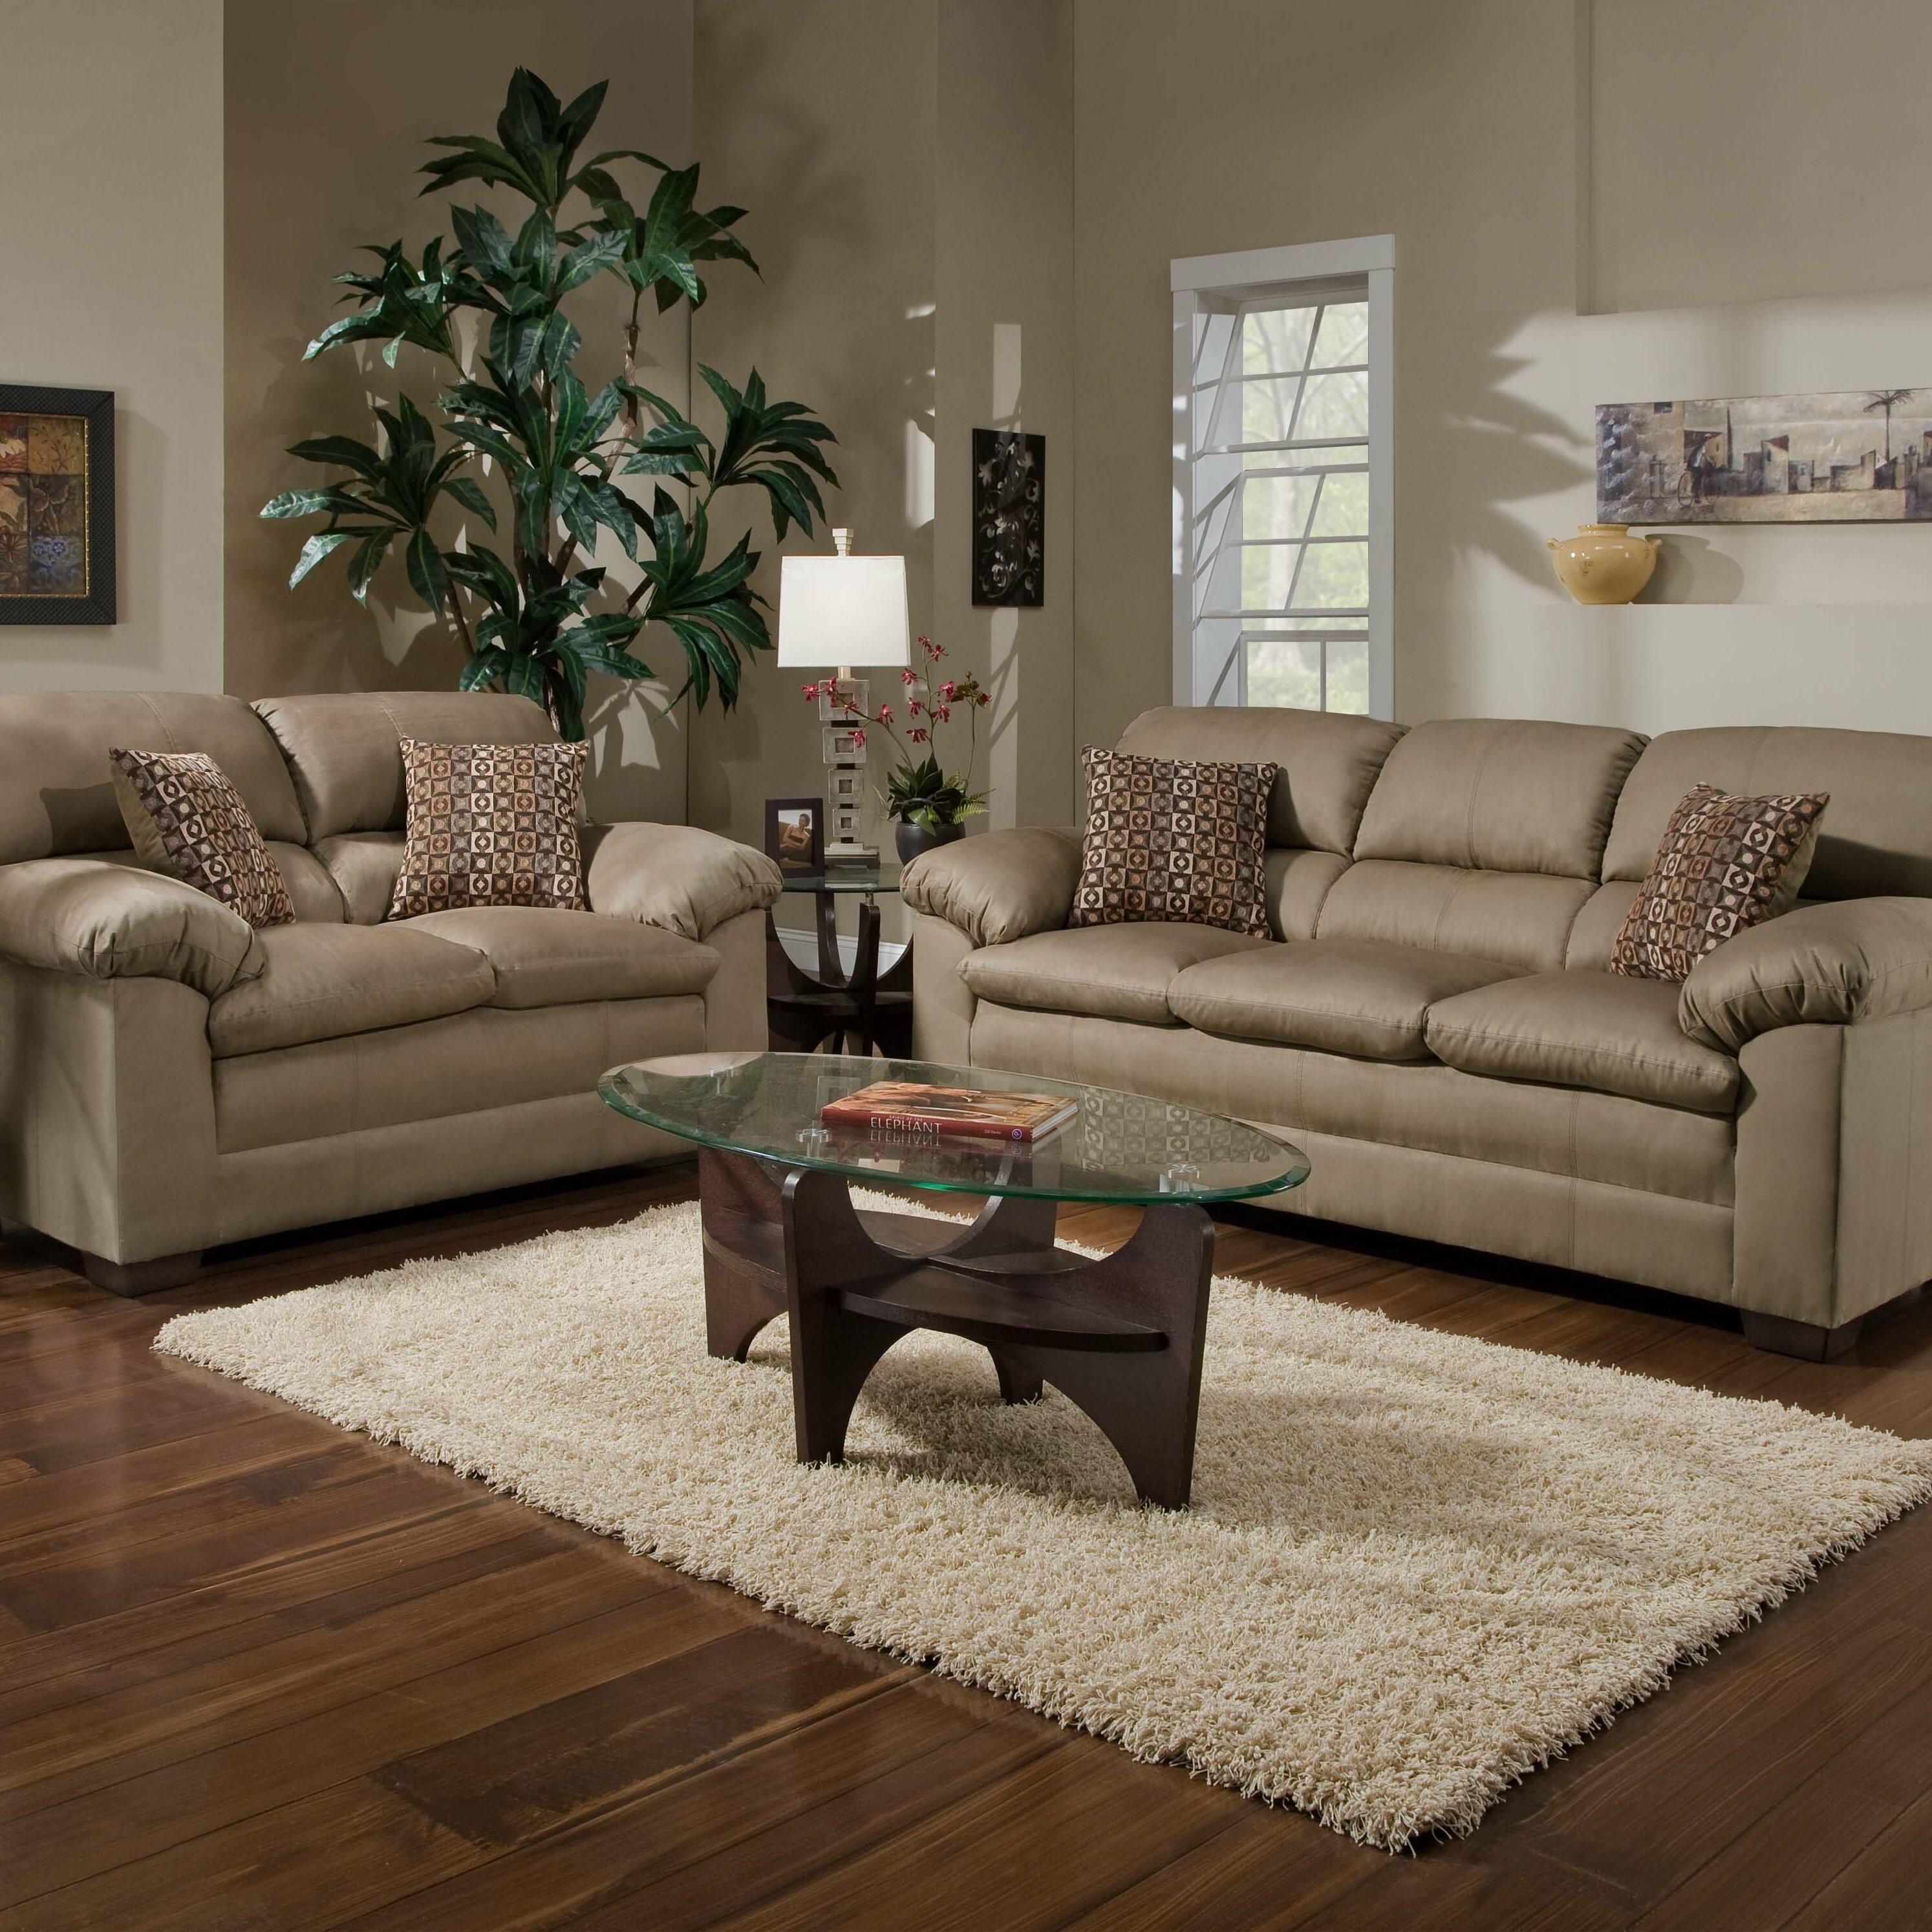 Red Barrel Studio Chamberlain Configurable Living Room Set Reviews Wayfair